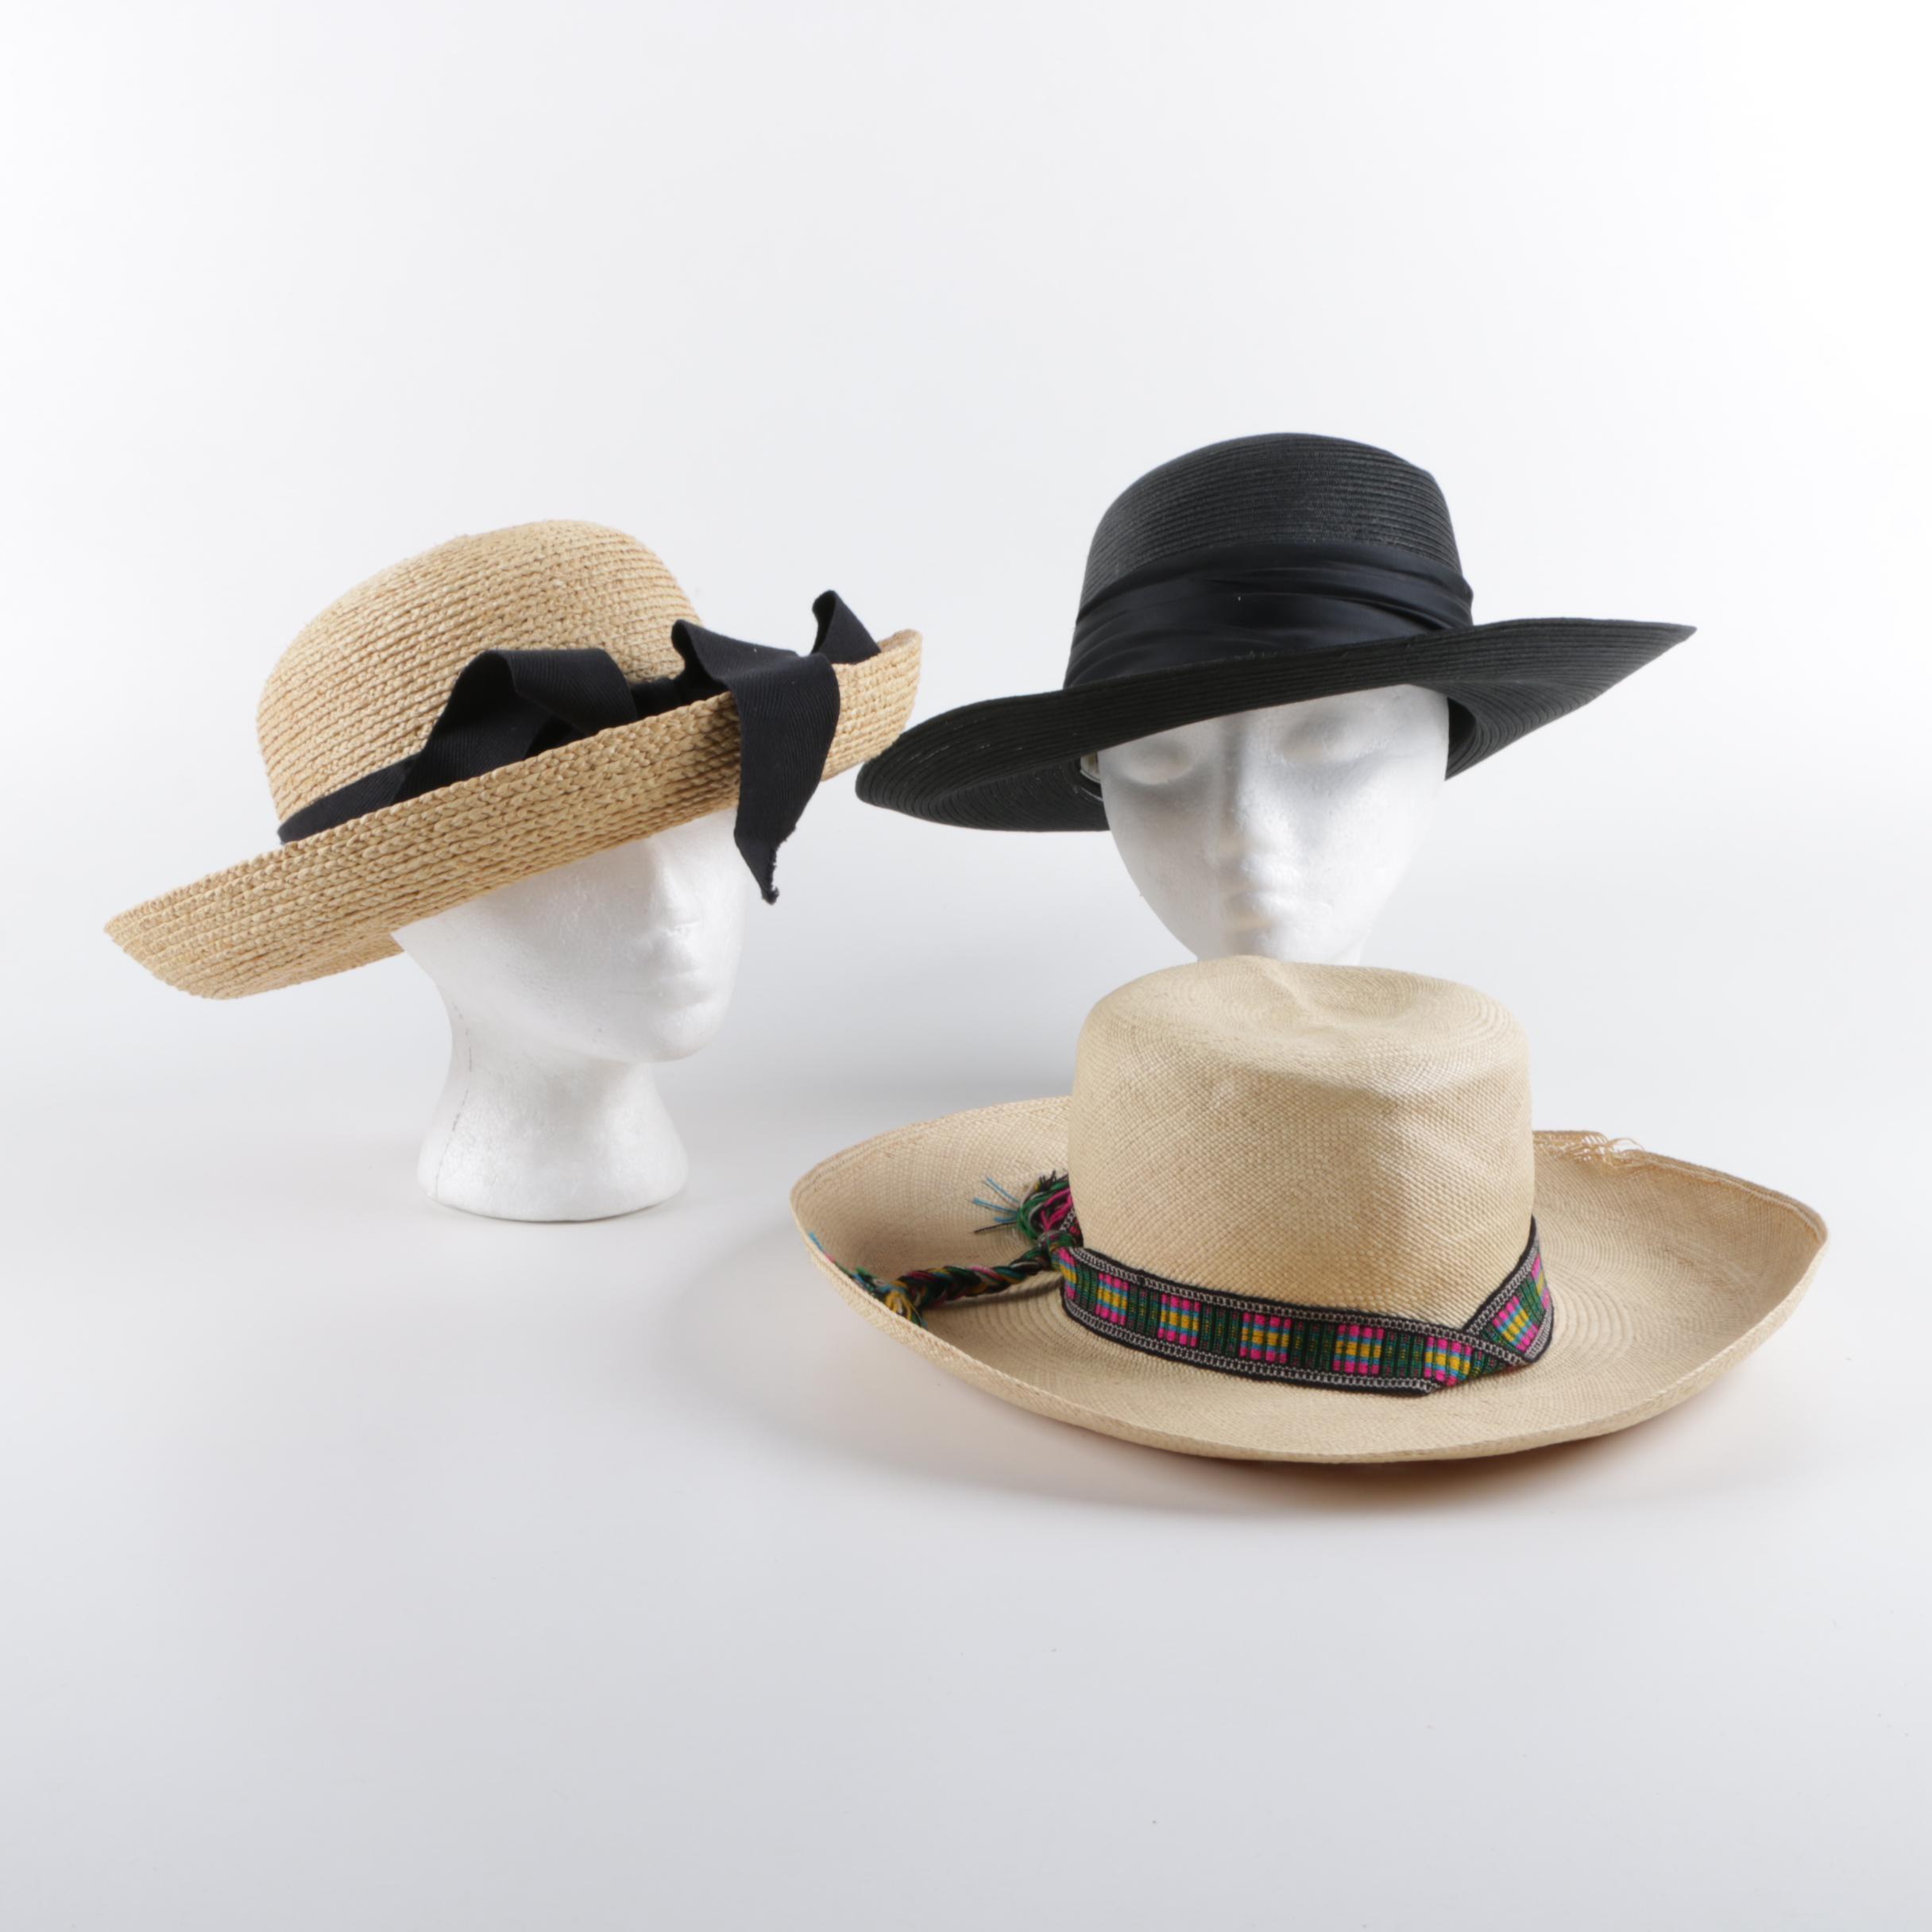 Women's Straw Sun Hats, Including Helen Kaminski